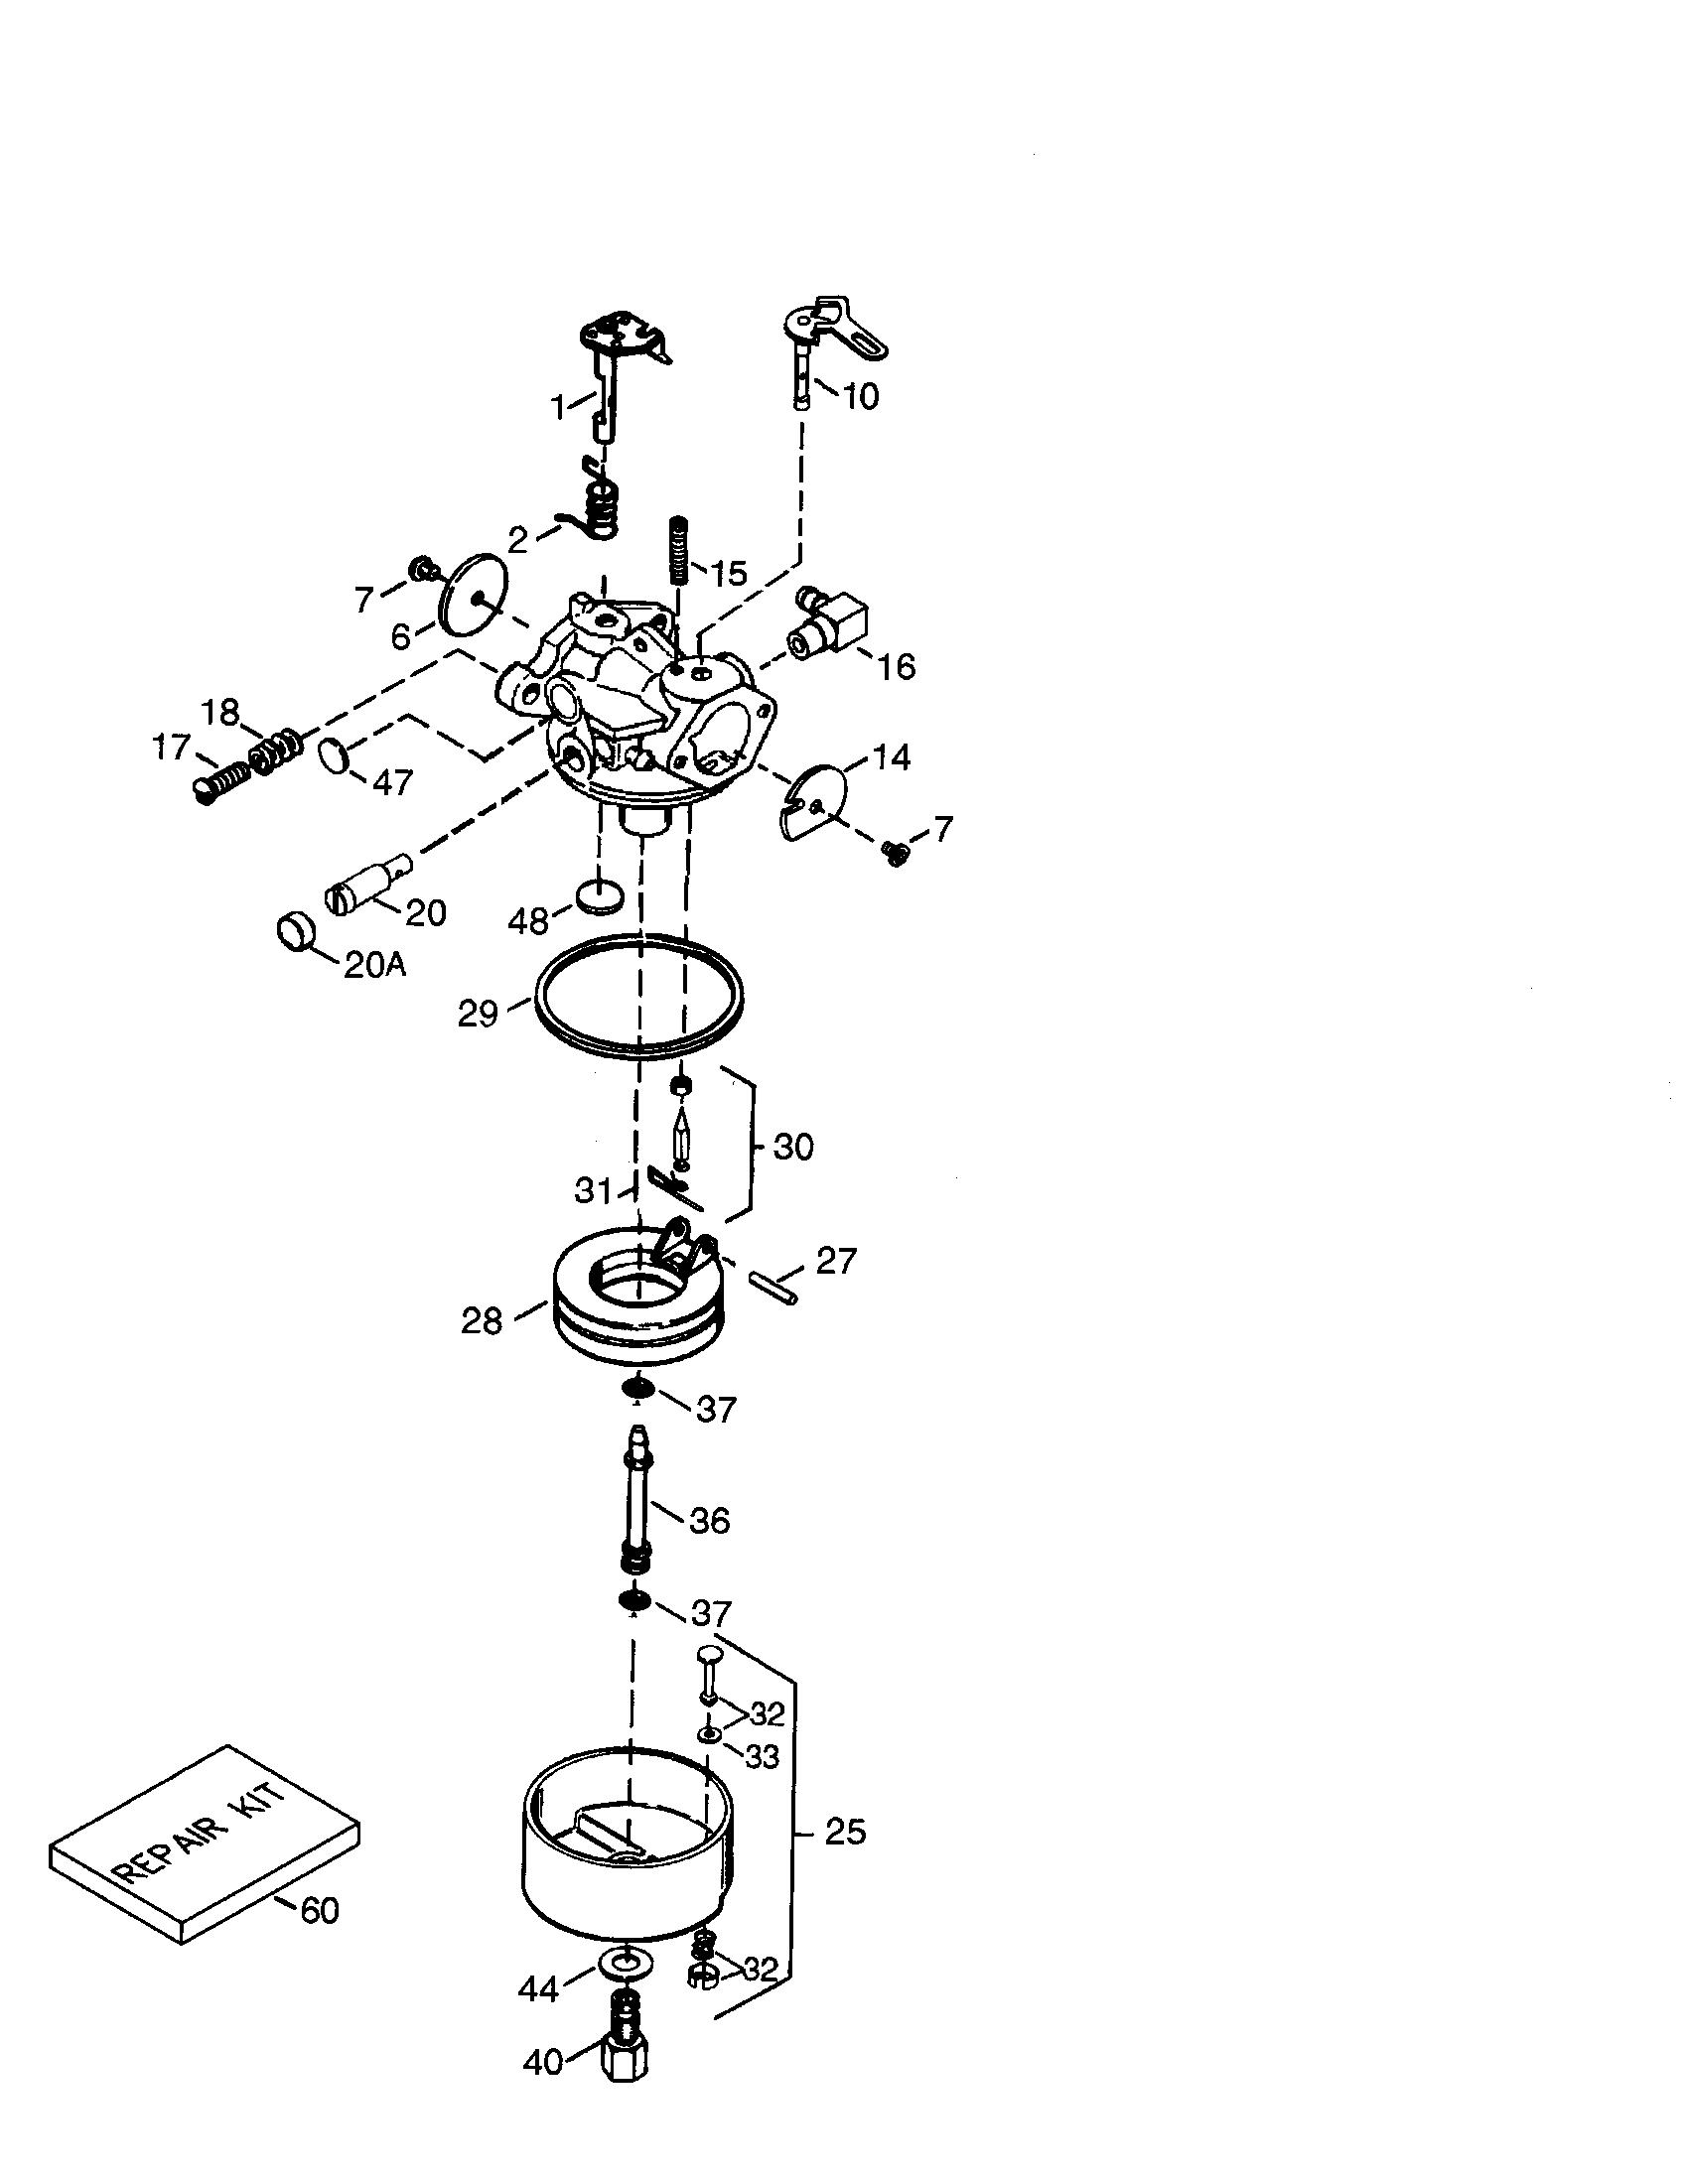 Tecumseh model HSSK50-67414U engine genuine parts